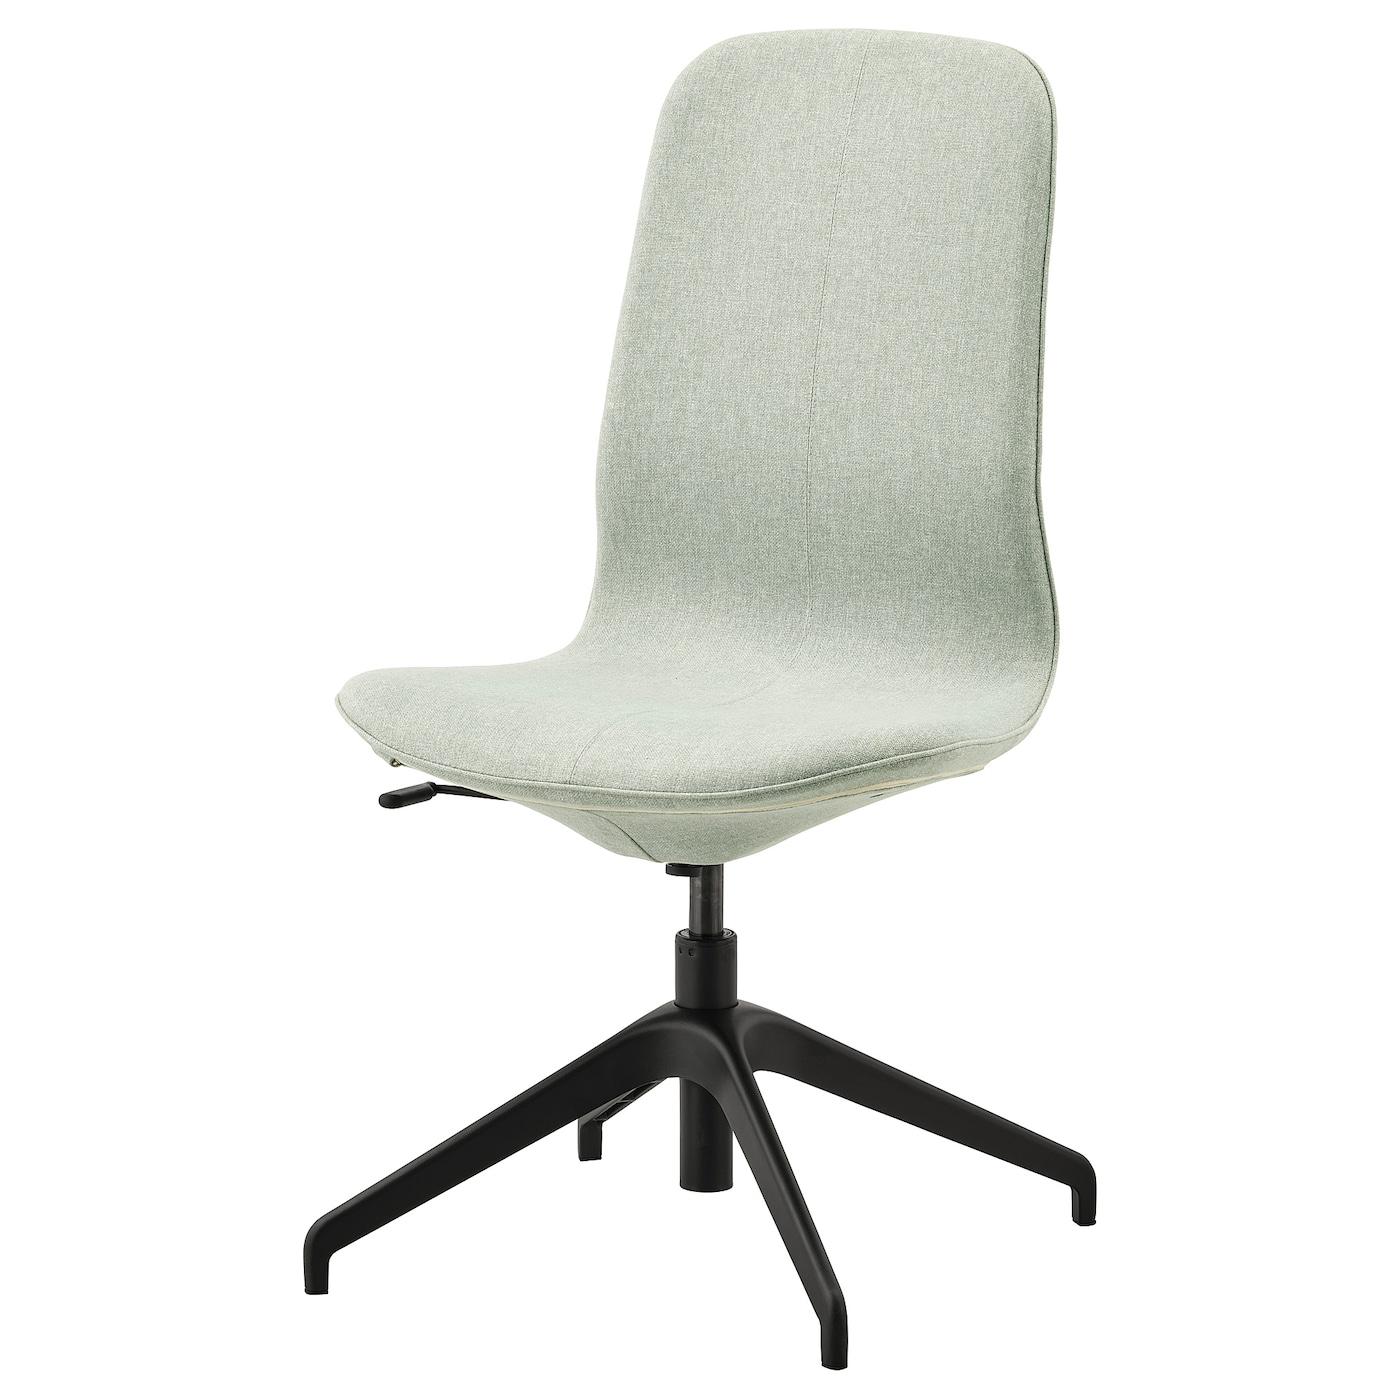 IKEA LÅNGFJÄLL Konferenzstuhl Gunnared hellgrün, schwarz Gunnared hellgrün | Büro > Bürostühle und Sessel  > Konferenzstühle | IKEA